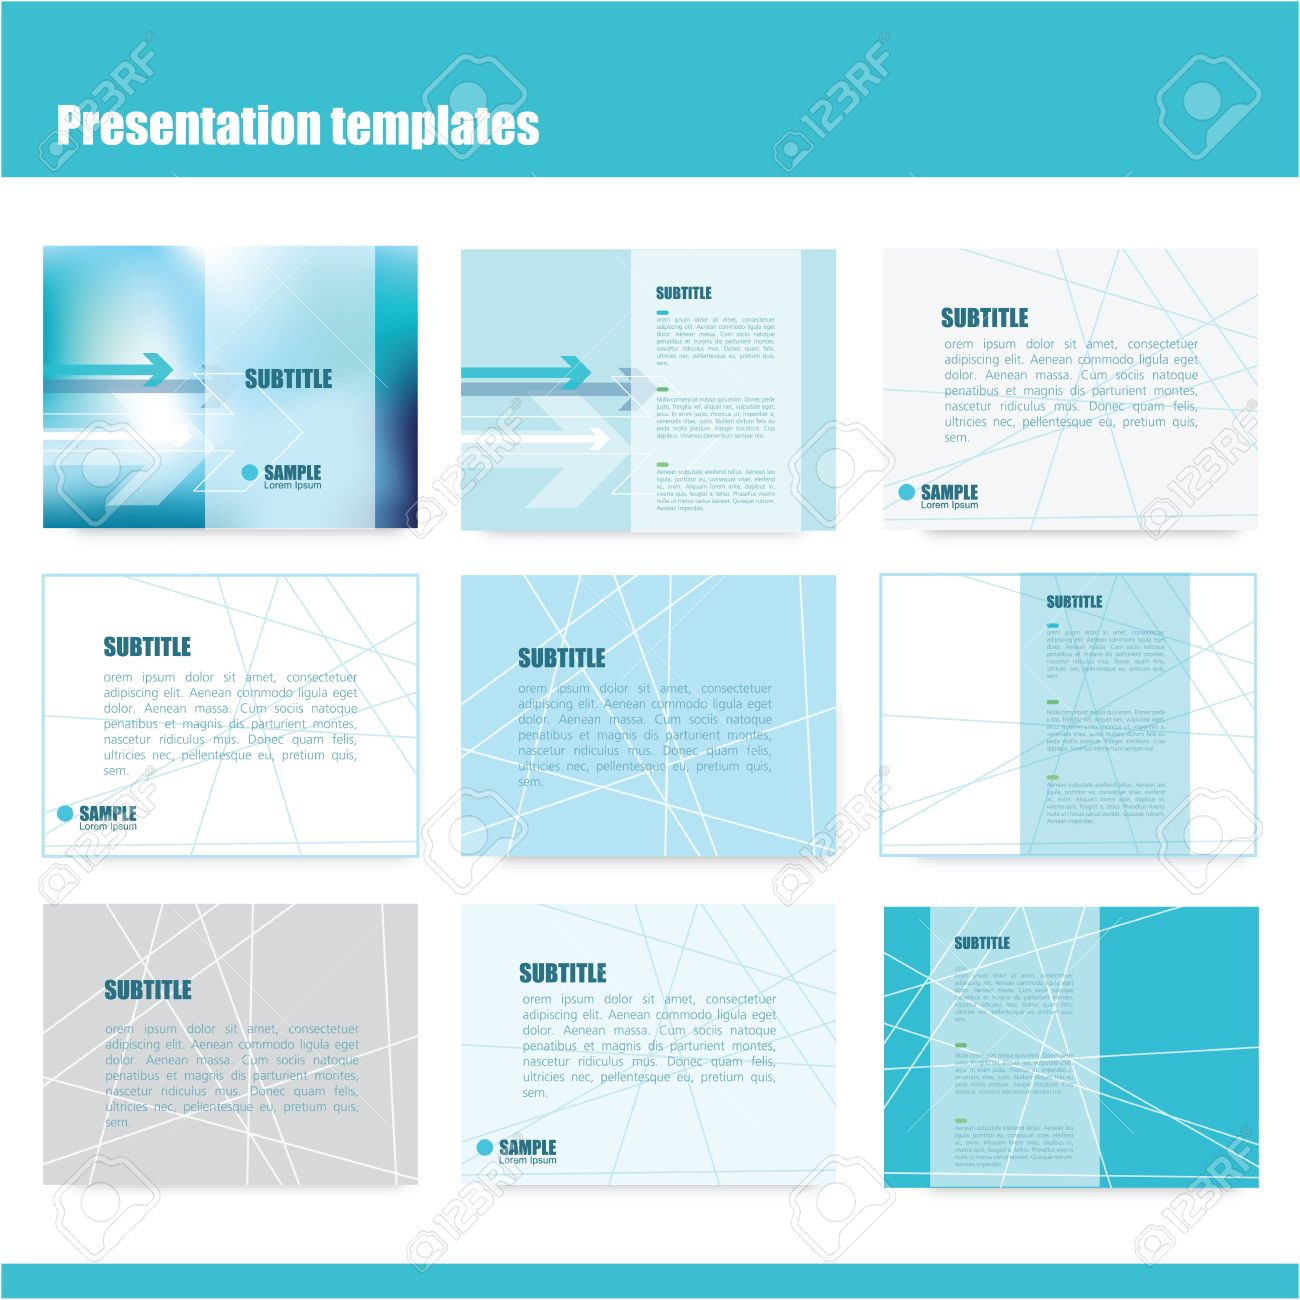 business presentation slide templates - power point template, Presentation templates